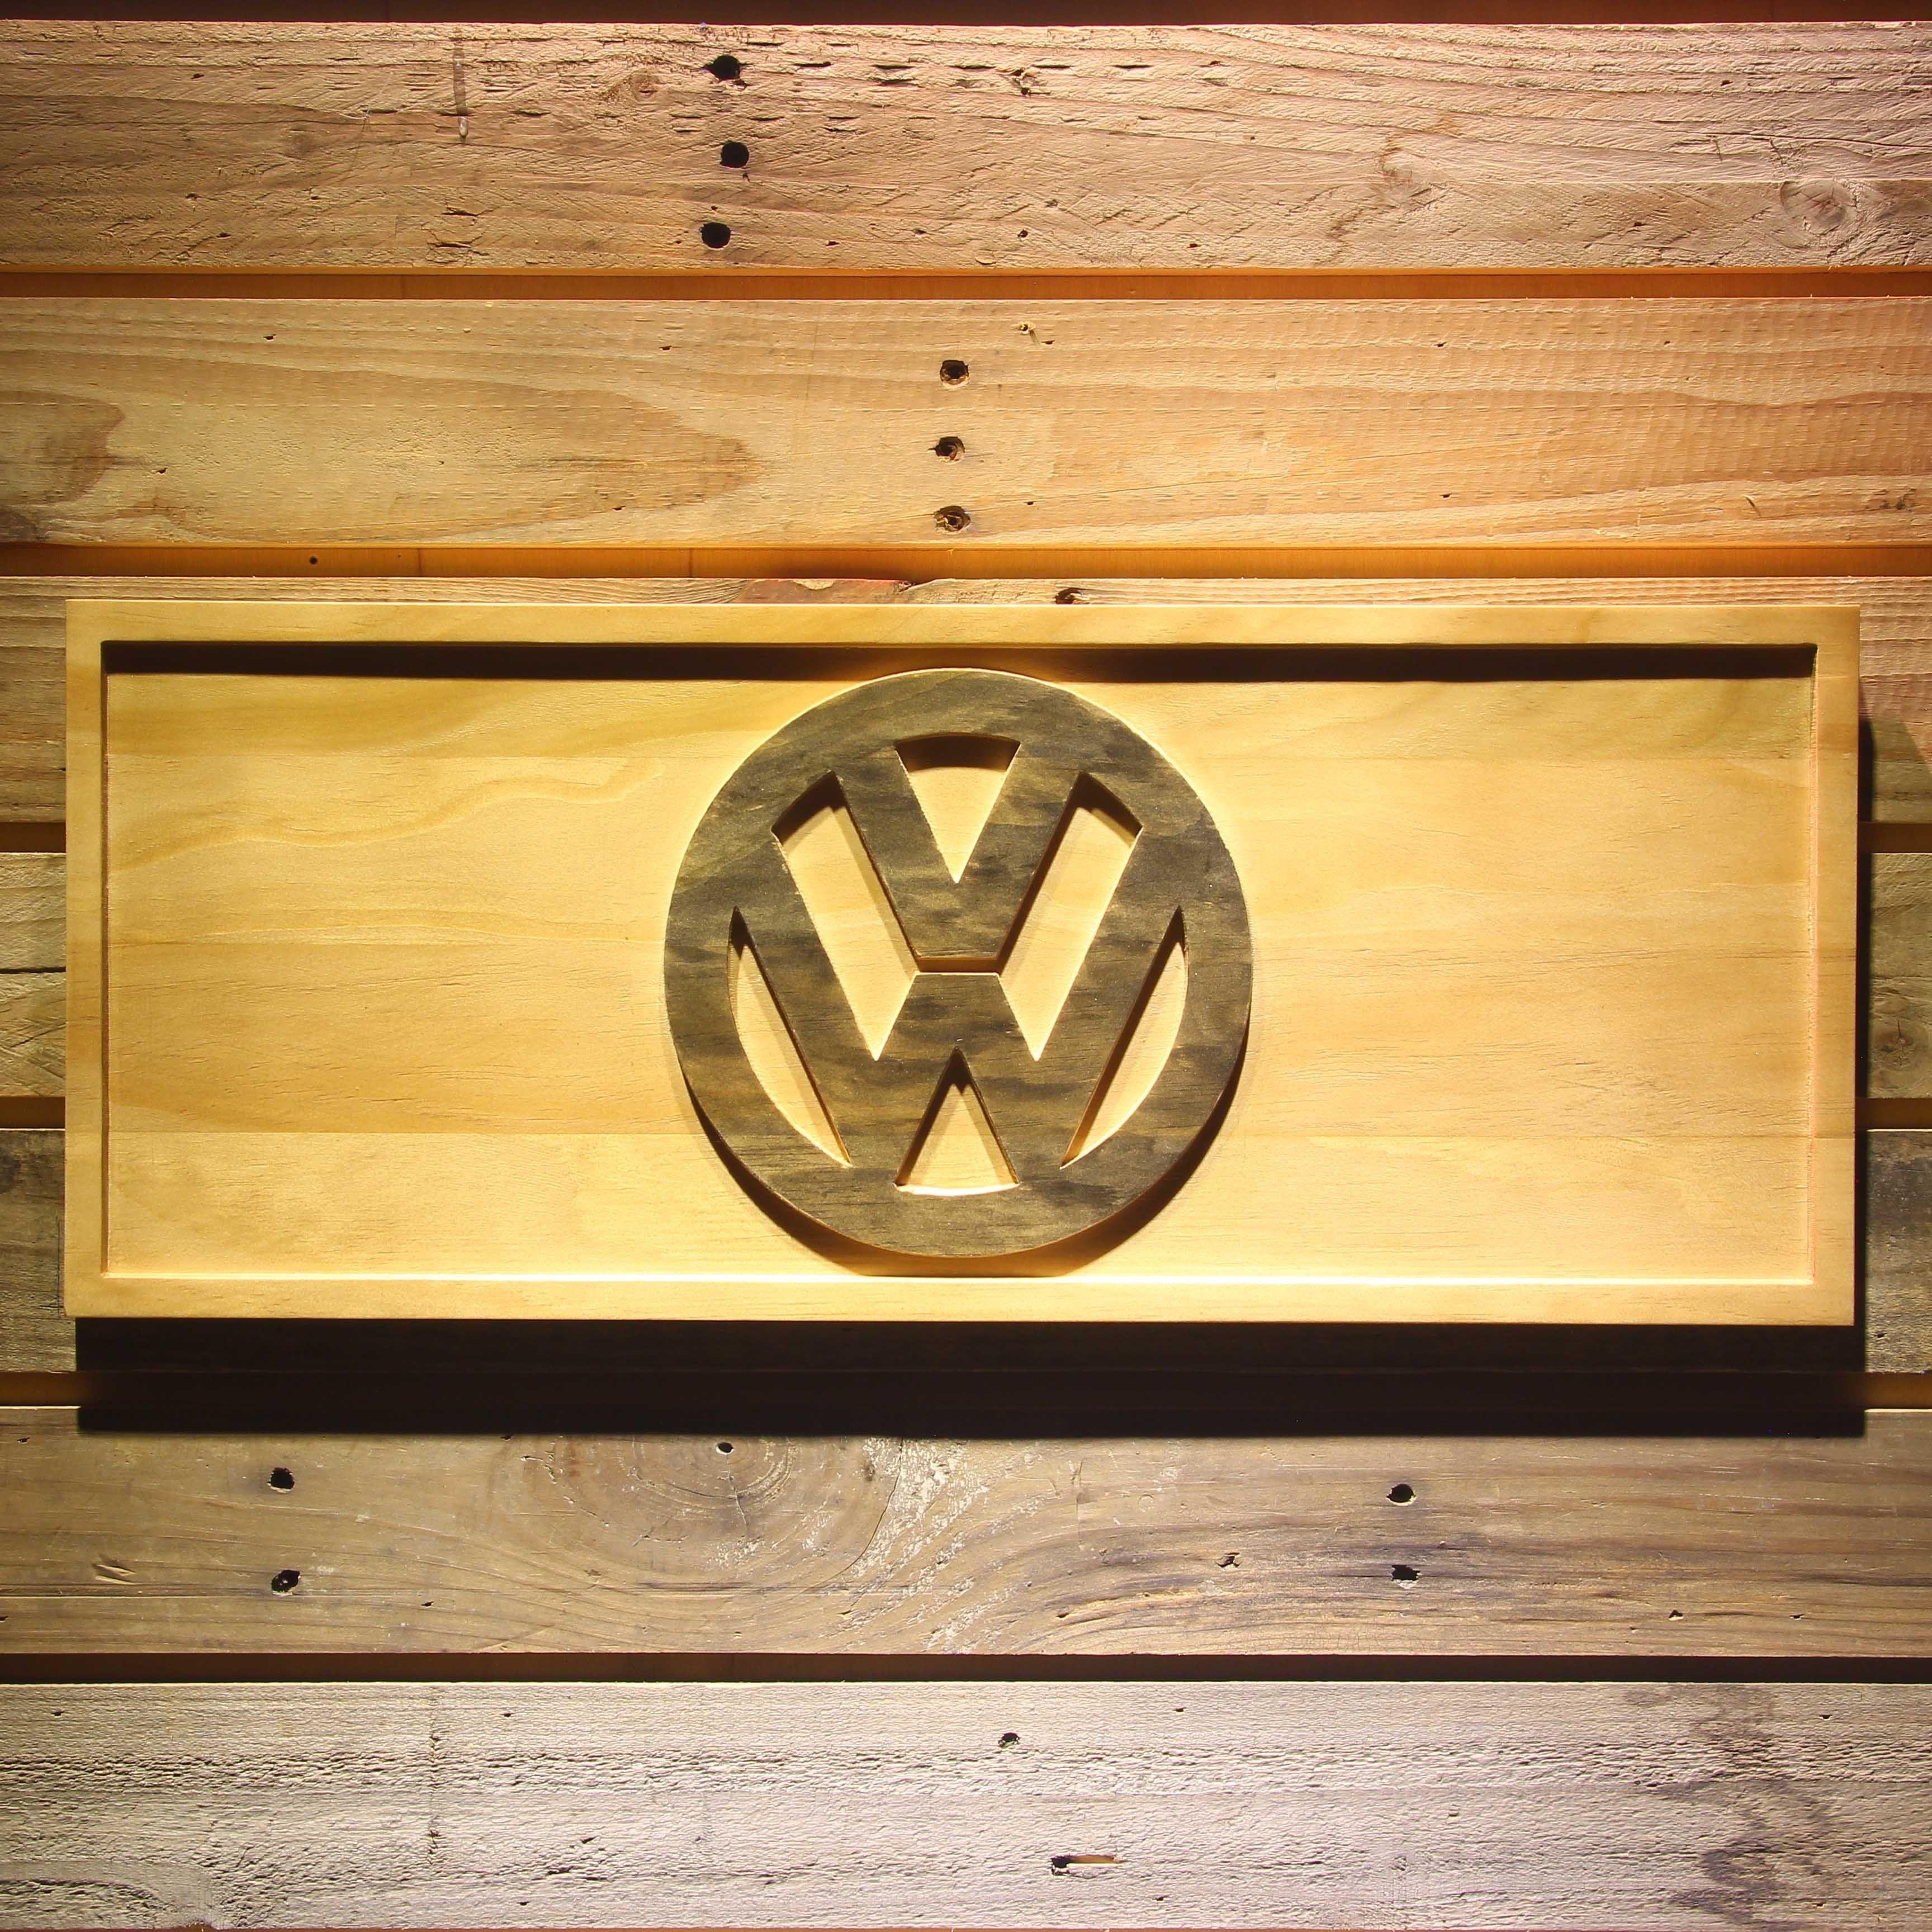 VW Volkswagen 3D Wooden Bar Sign